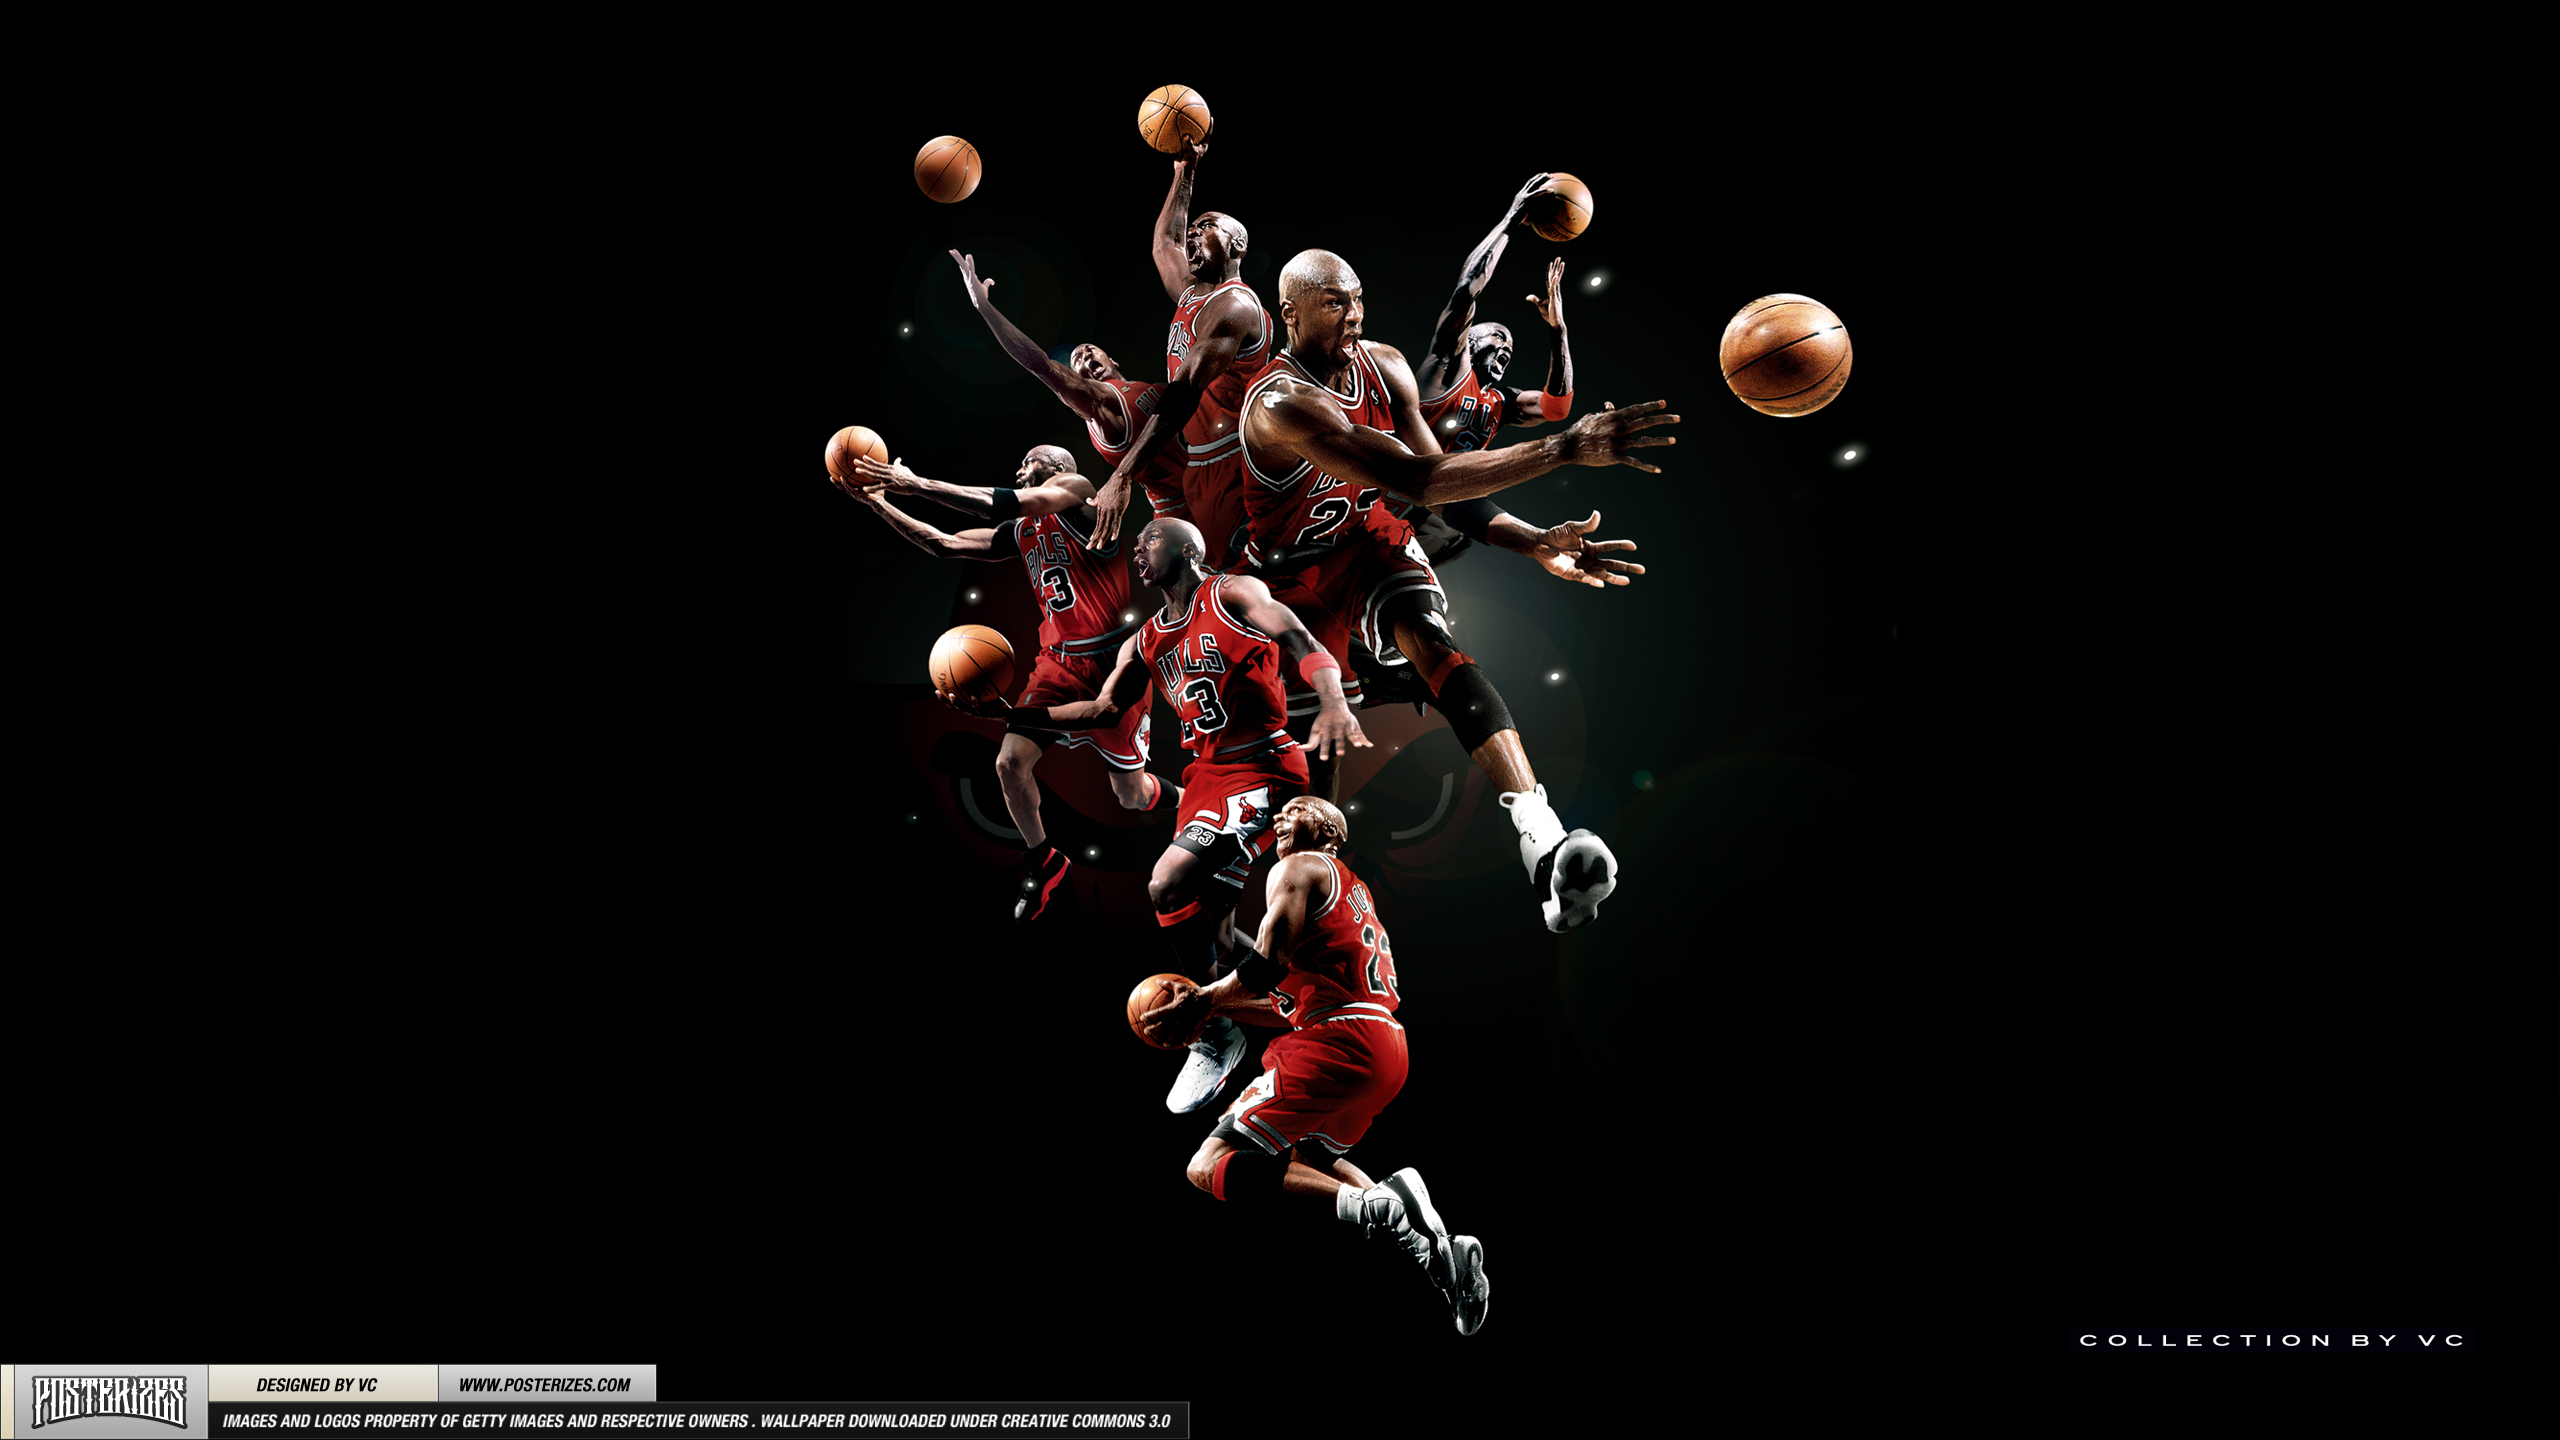 Michael Jordan Wallpaper 2560x1440 4550